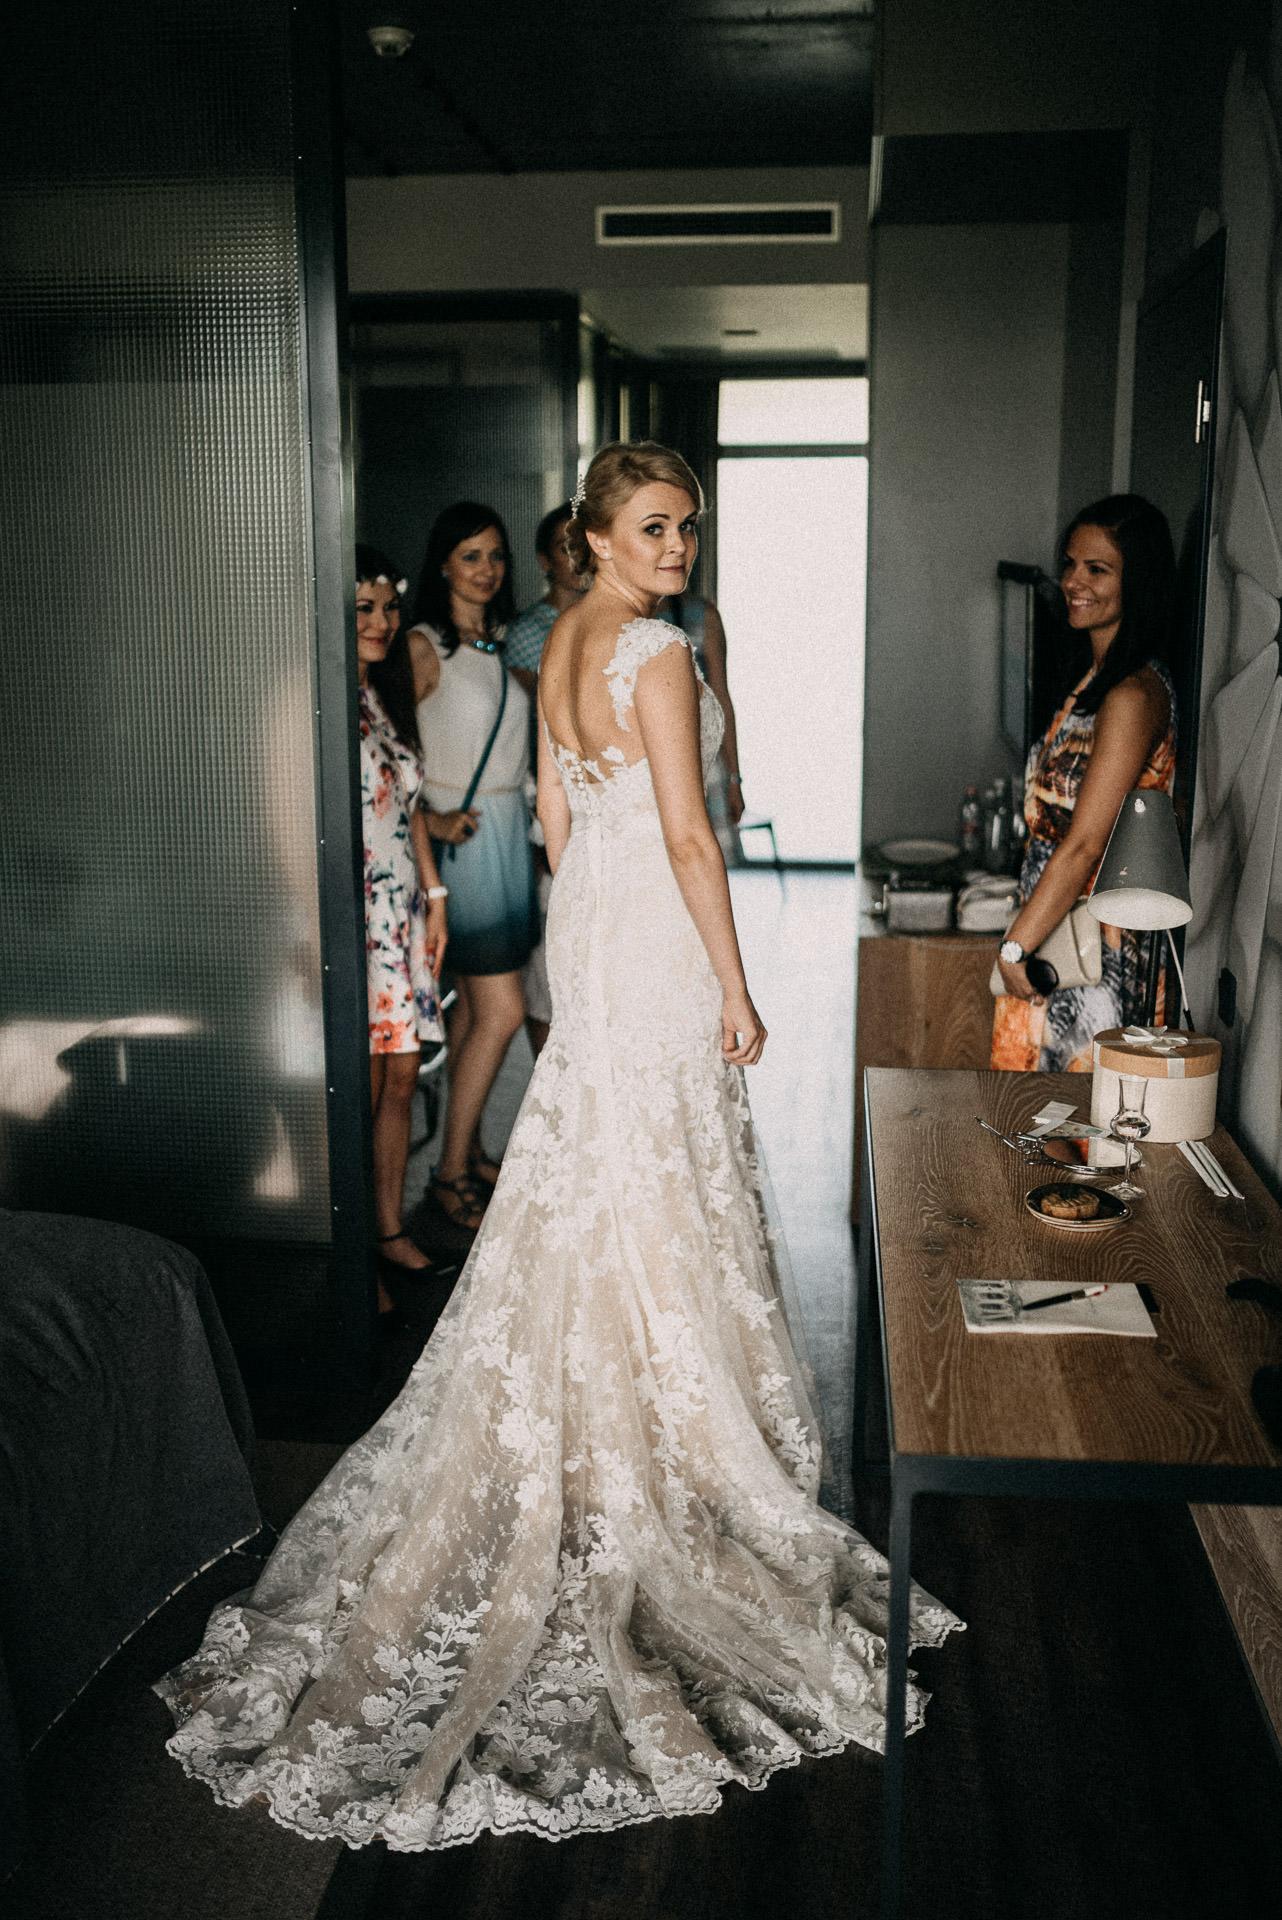 wedding dress bride bridesmaids